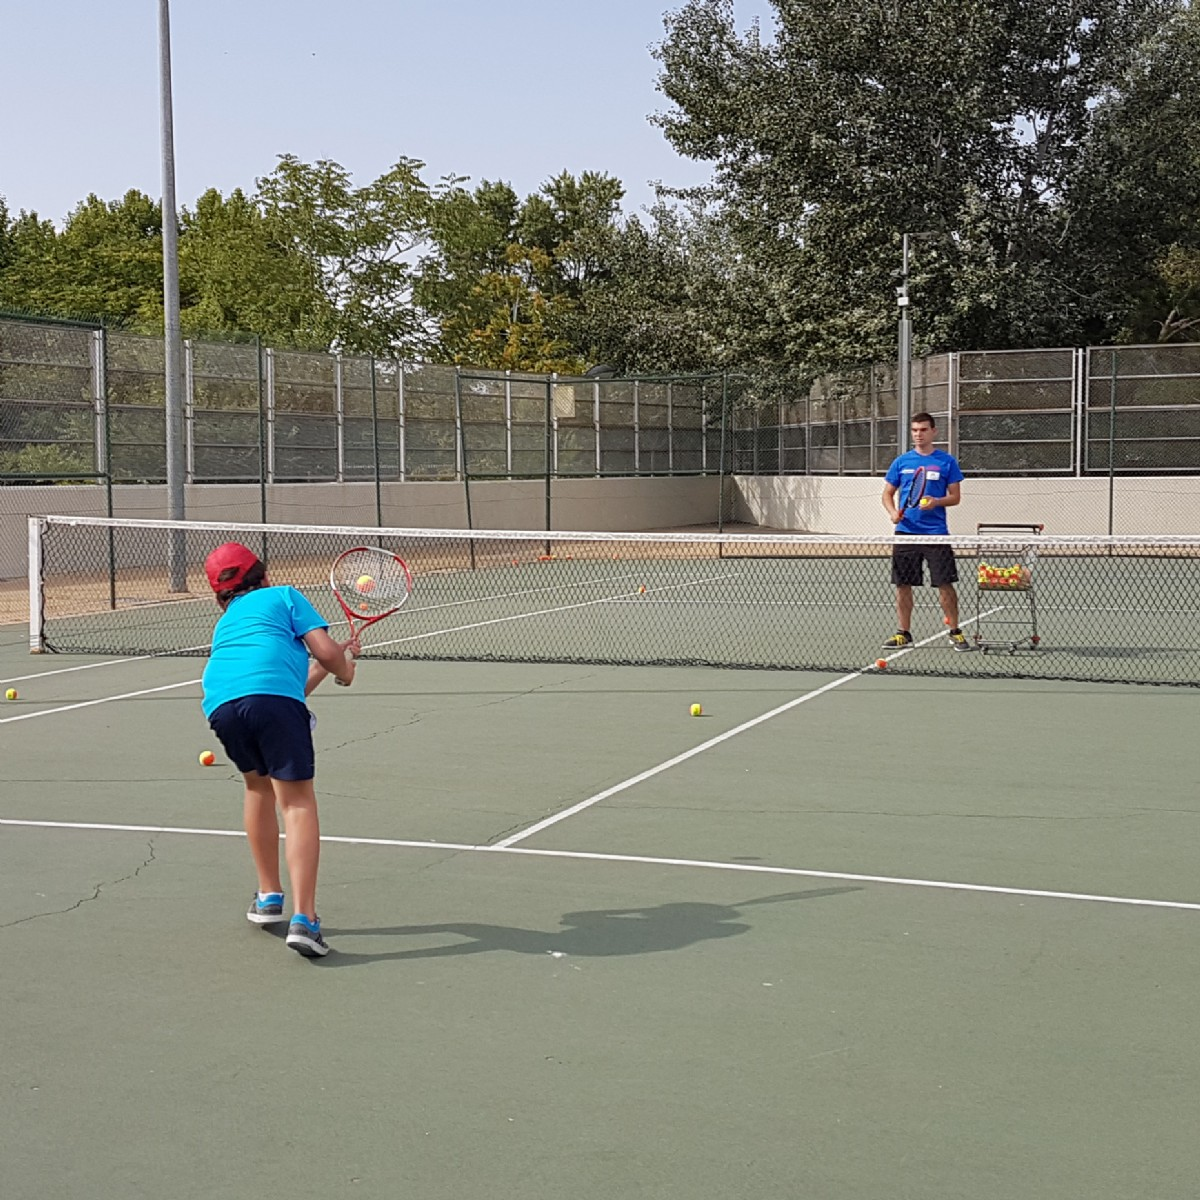 Cursillos Deportivos Municipales: Tenis  [2021/2022]